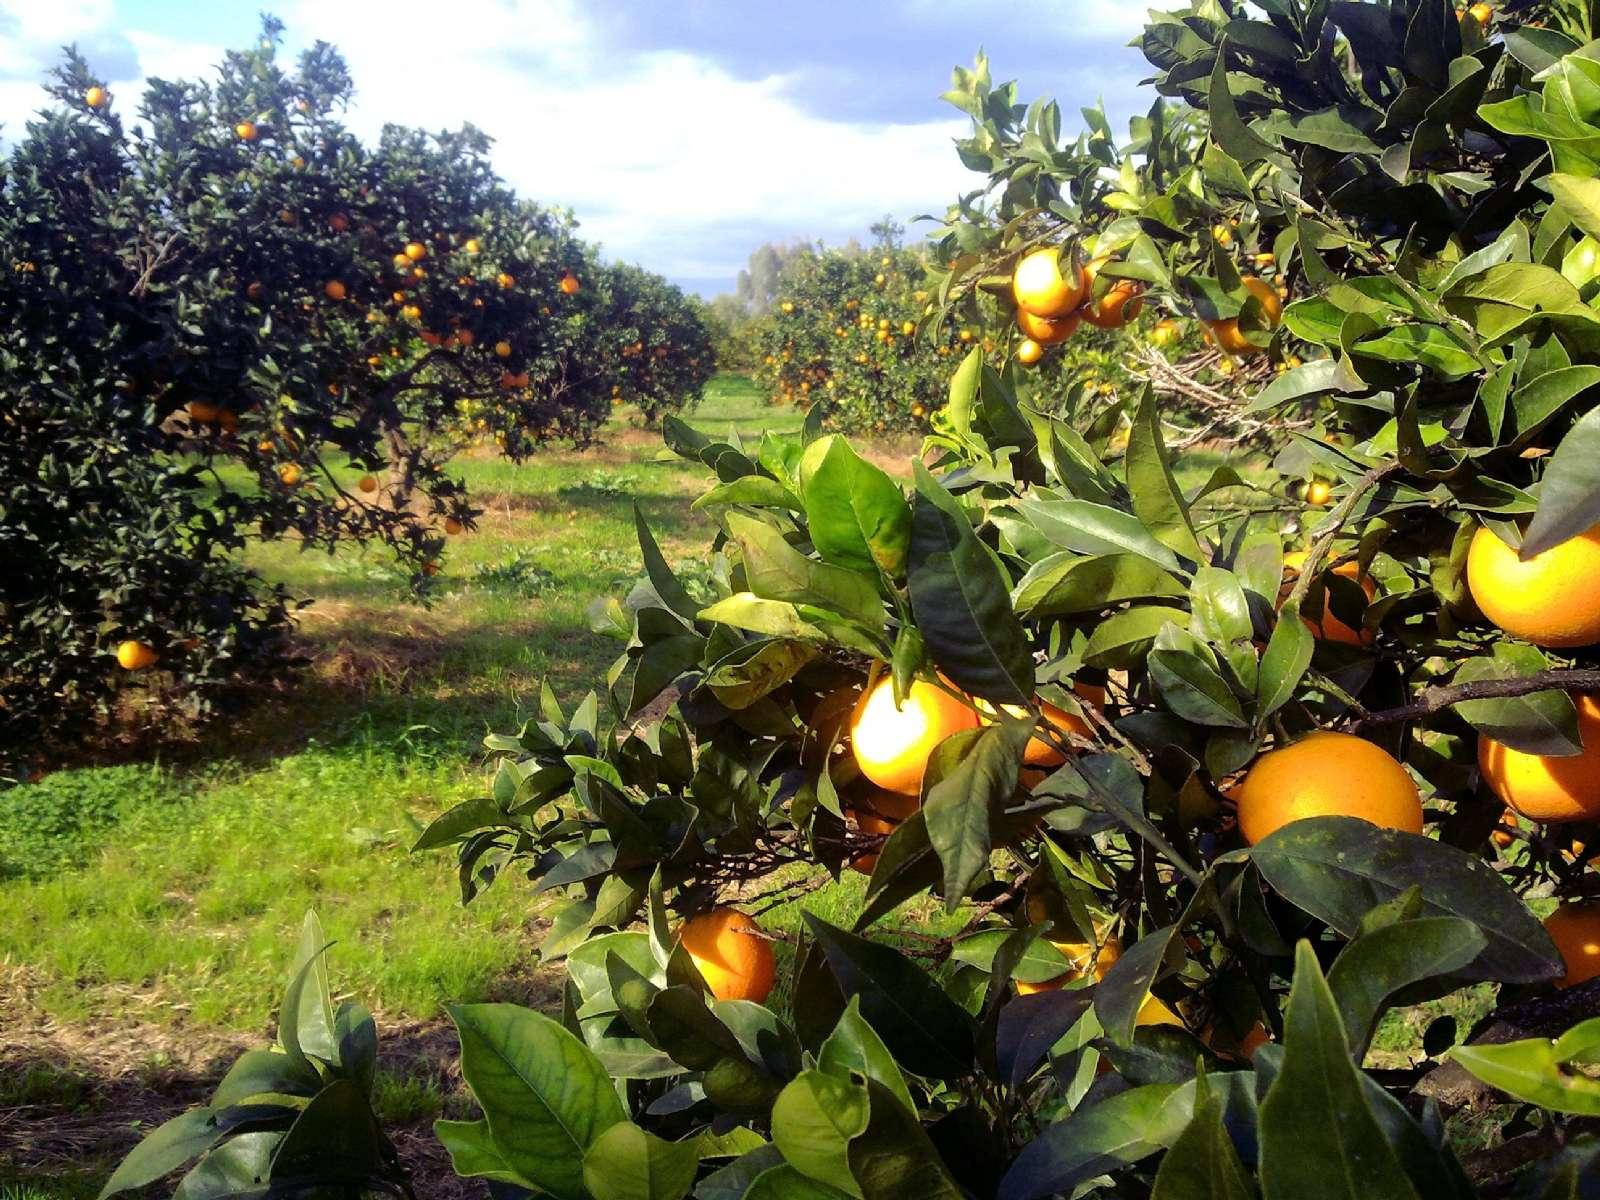 Gårdens apelsinplantage